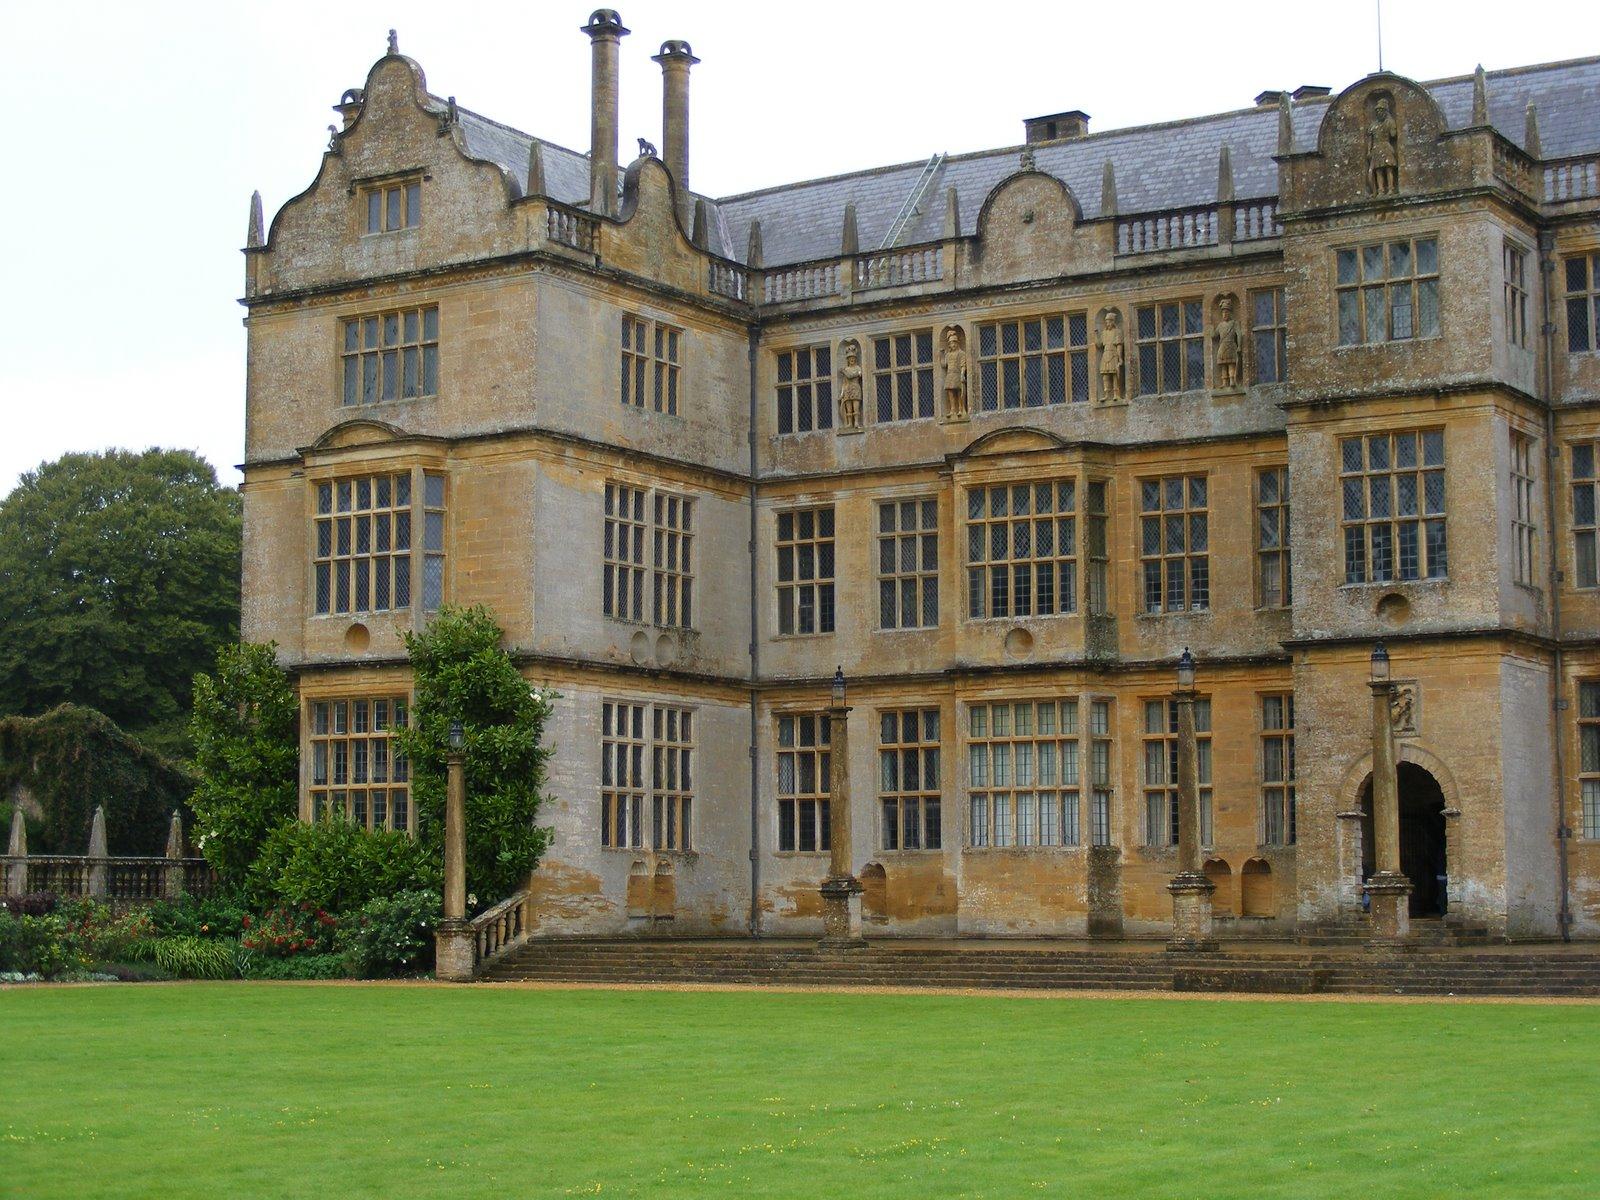 Montacute viaje a visitar jardines ingleses - Imagenes de casas inglesas ...